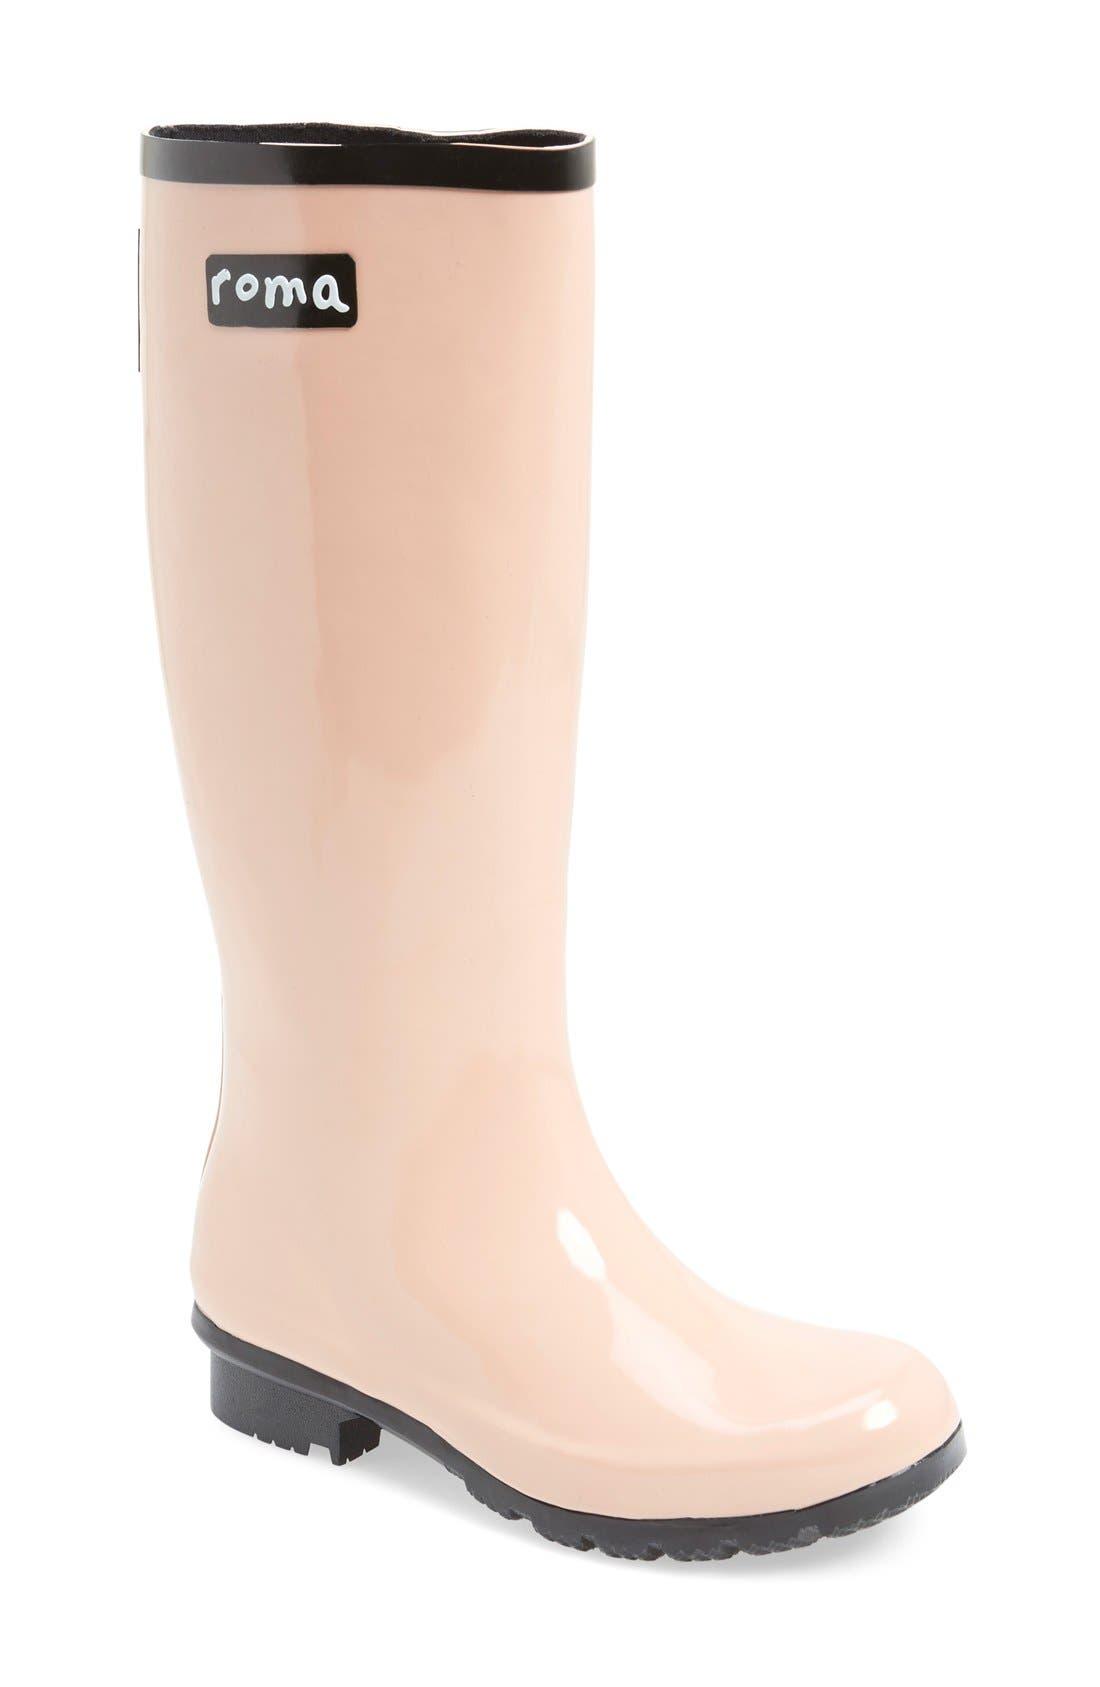 Main Image - roma 'Emma' Glossy Rain Boot (Women)